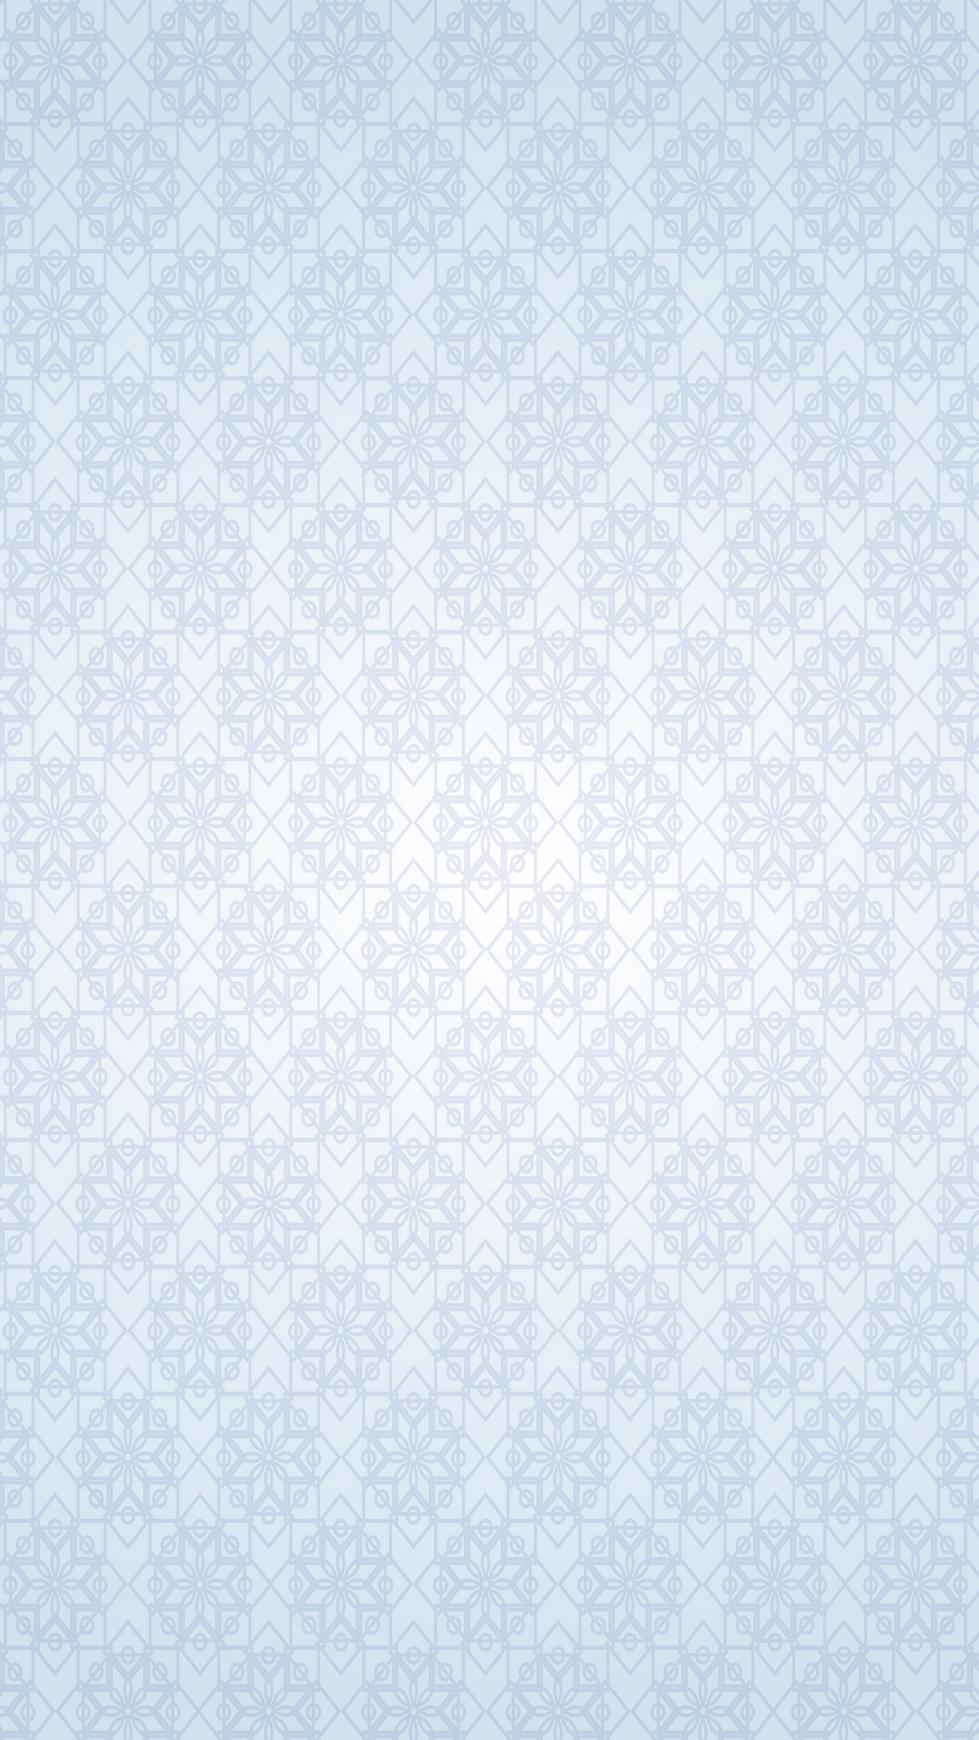 RAYA2 blue background-01.png